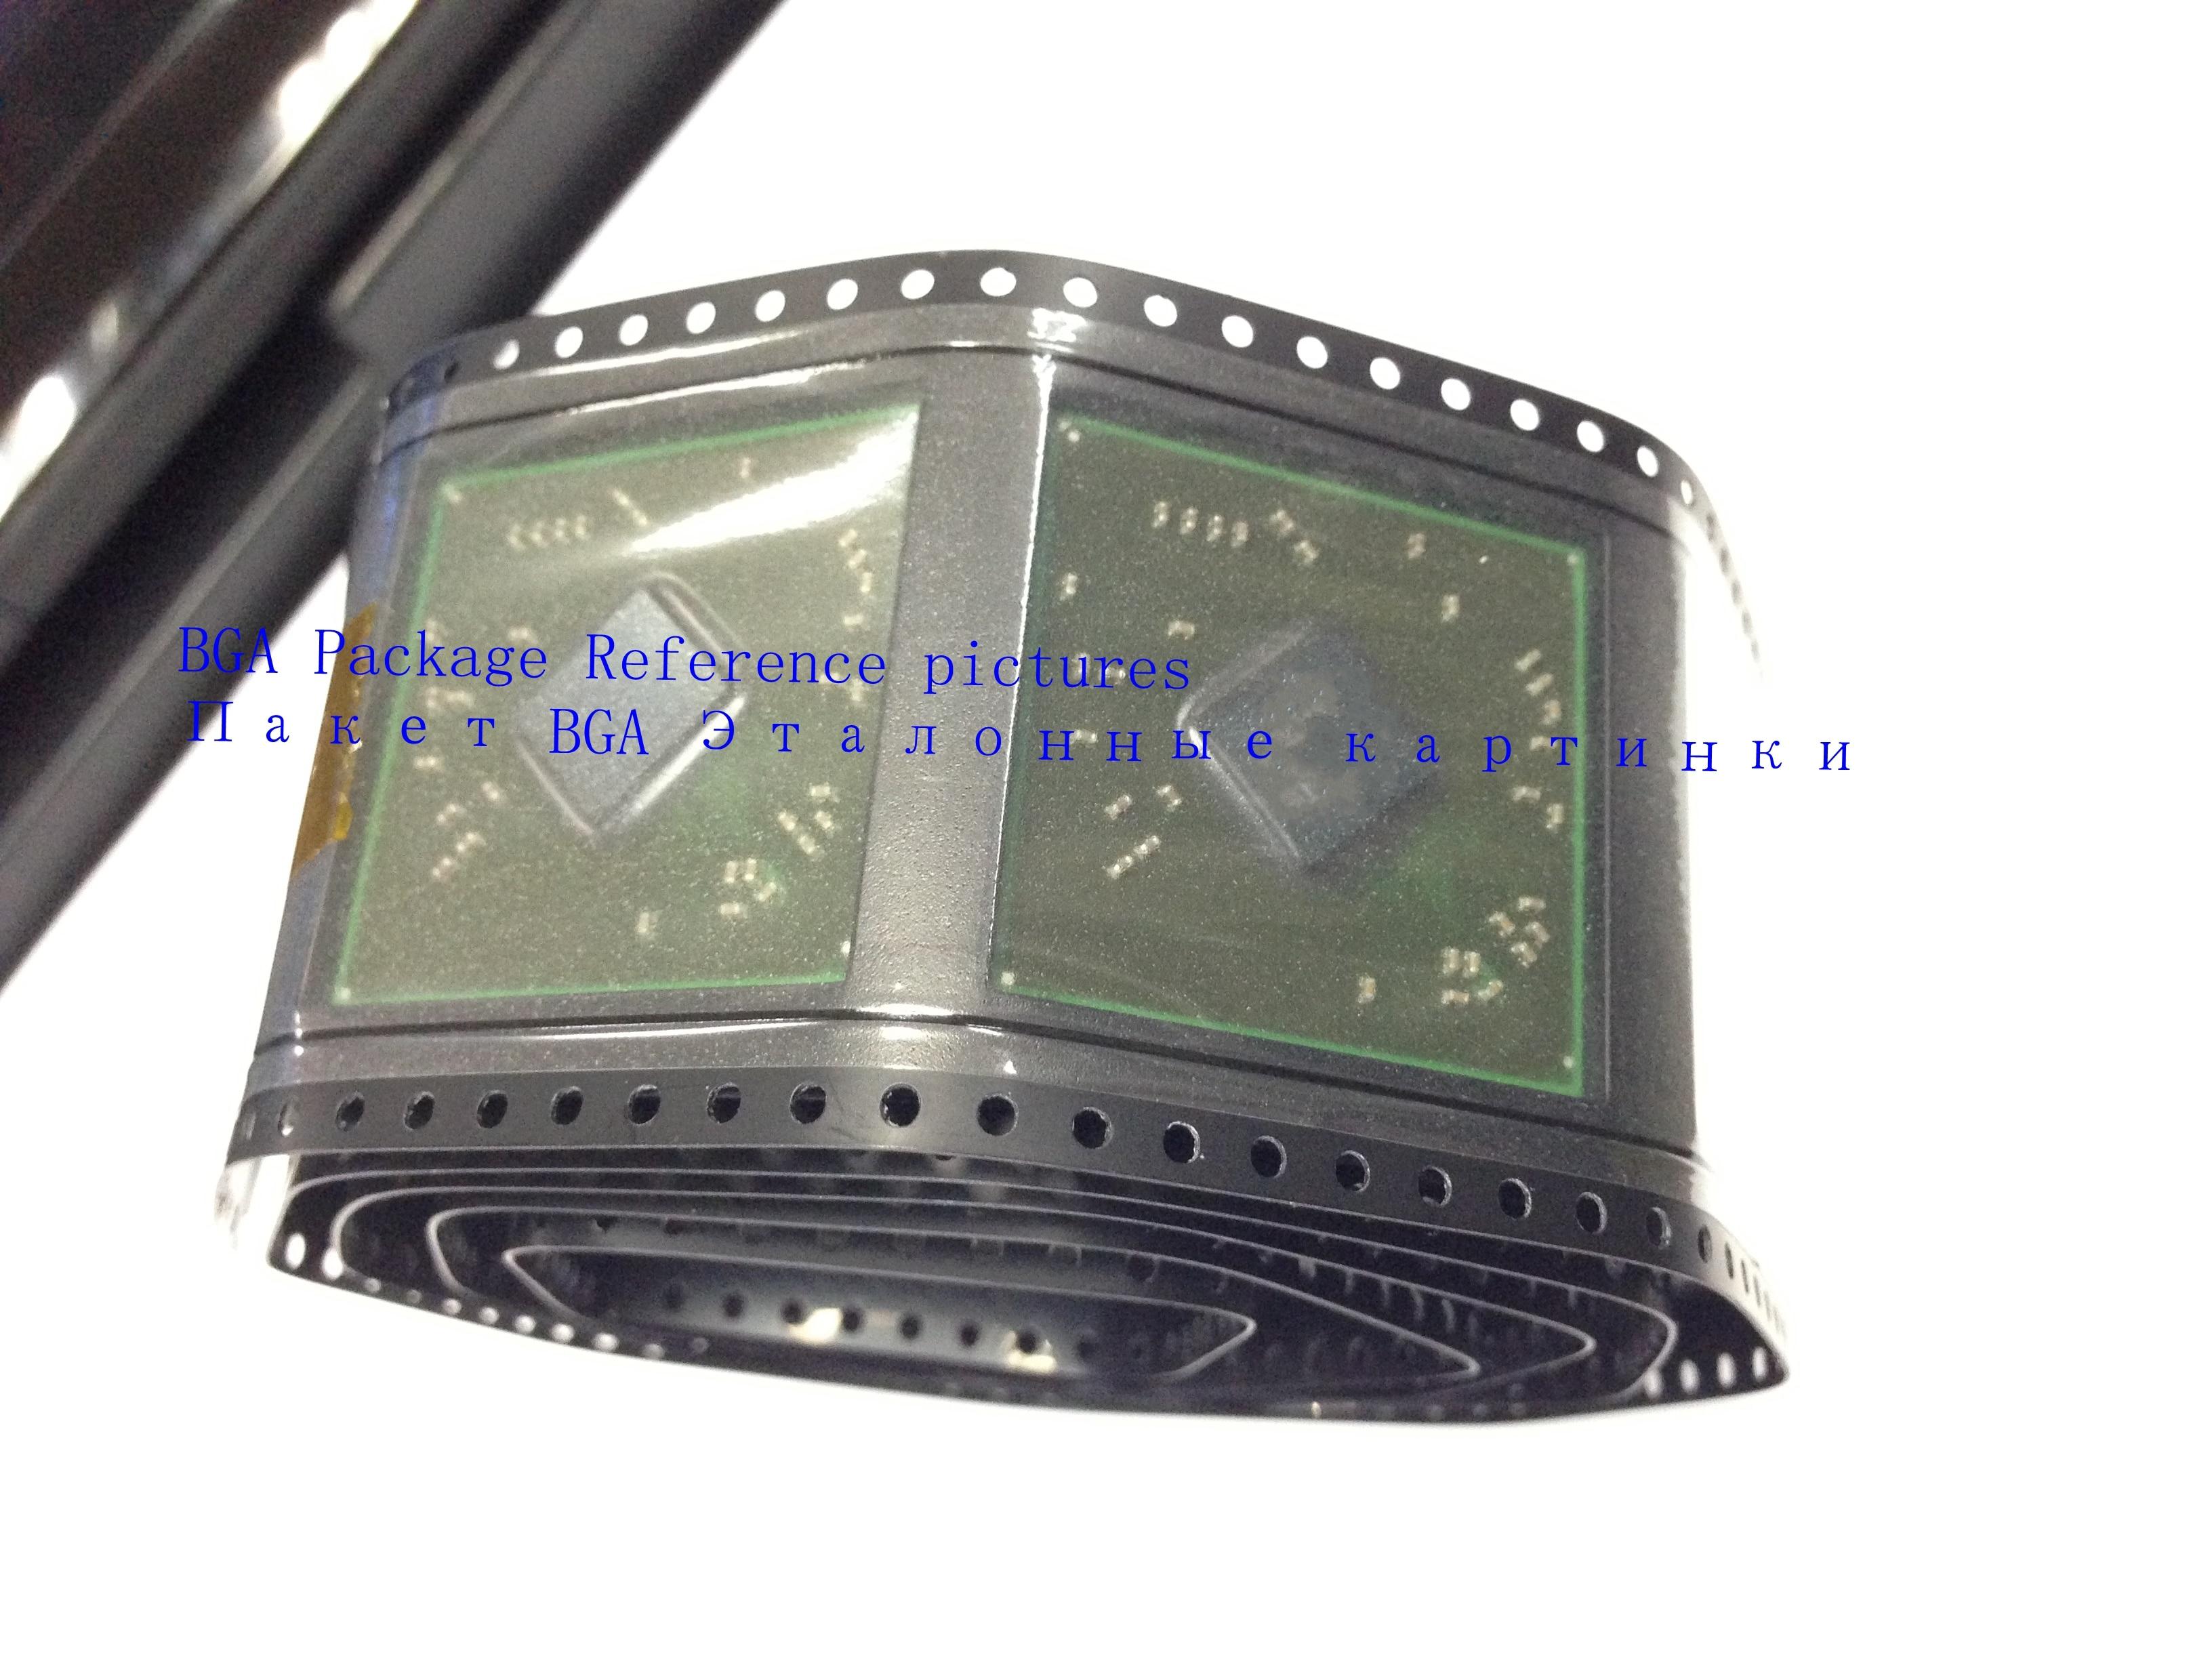 1pcs/lot 100% test very good product N12P-GS-A1 N12P GS A1 bga chip reball with balls IC chips1pcs/lot 100% test very good product N12P-GS-A1 N12P GS A1 bga chip reball with balls IC chips